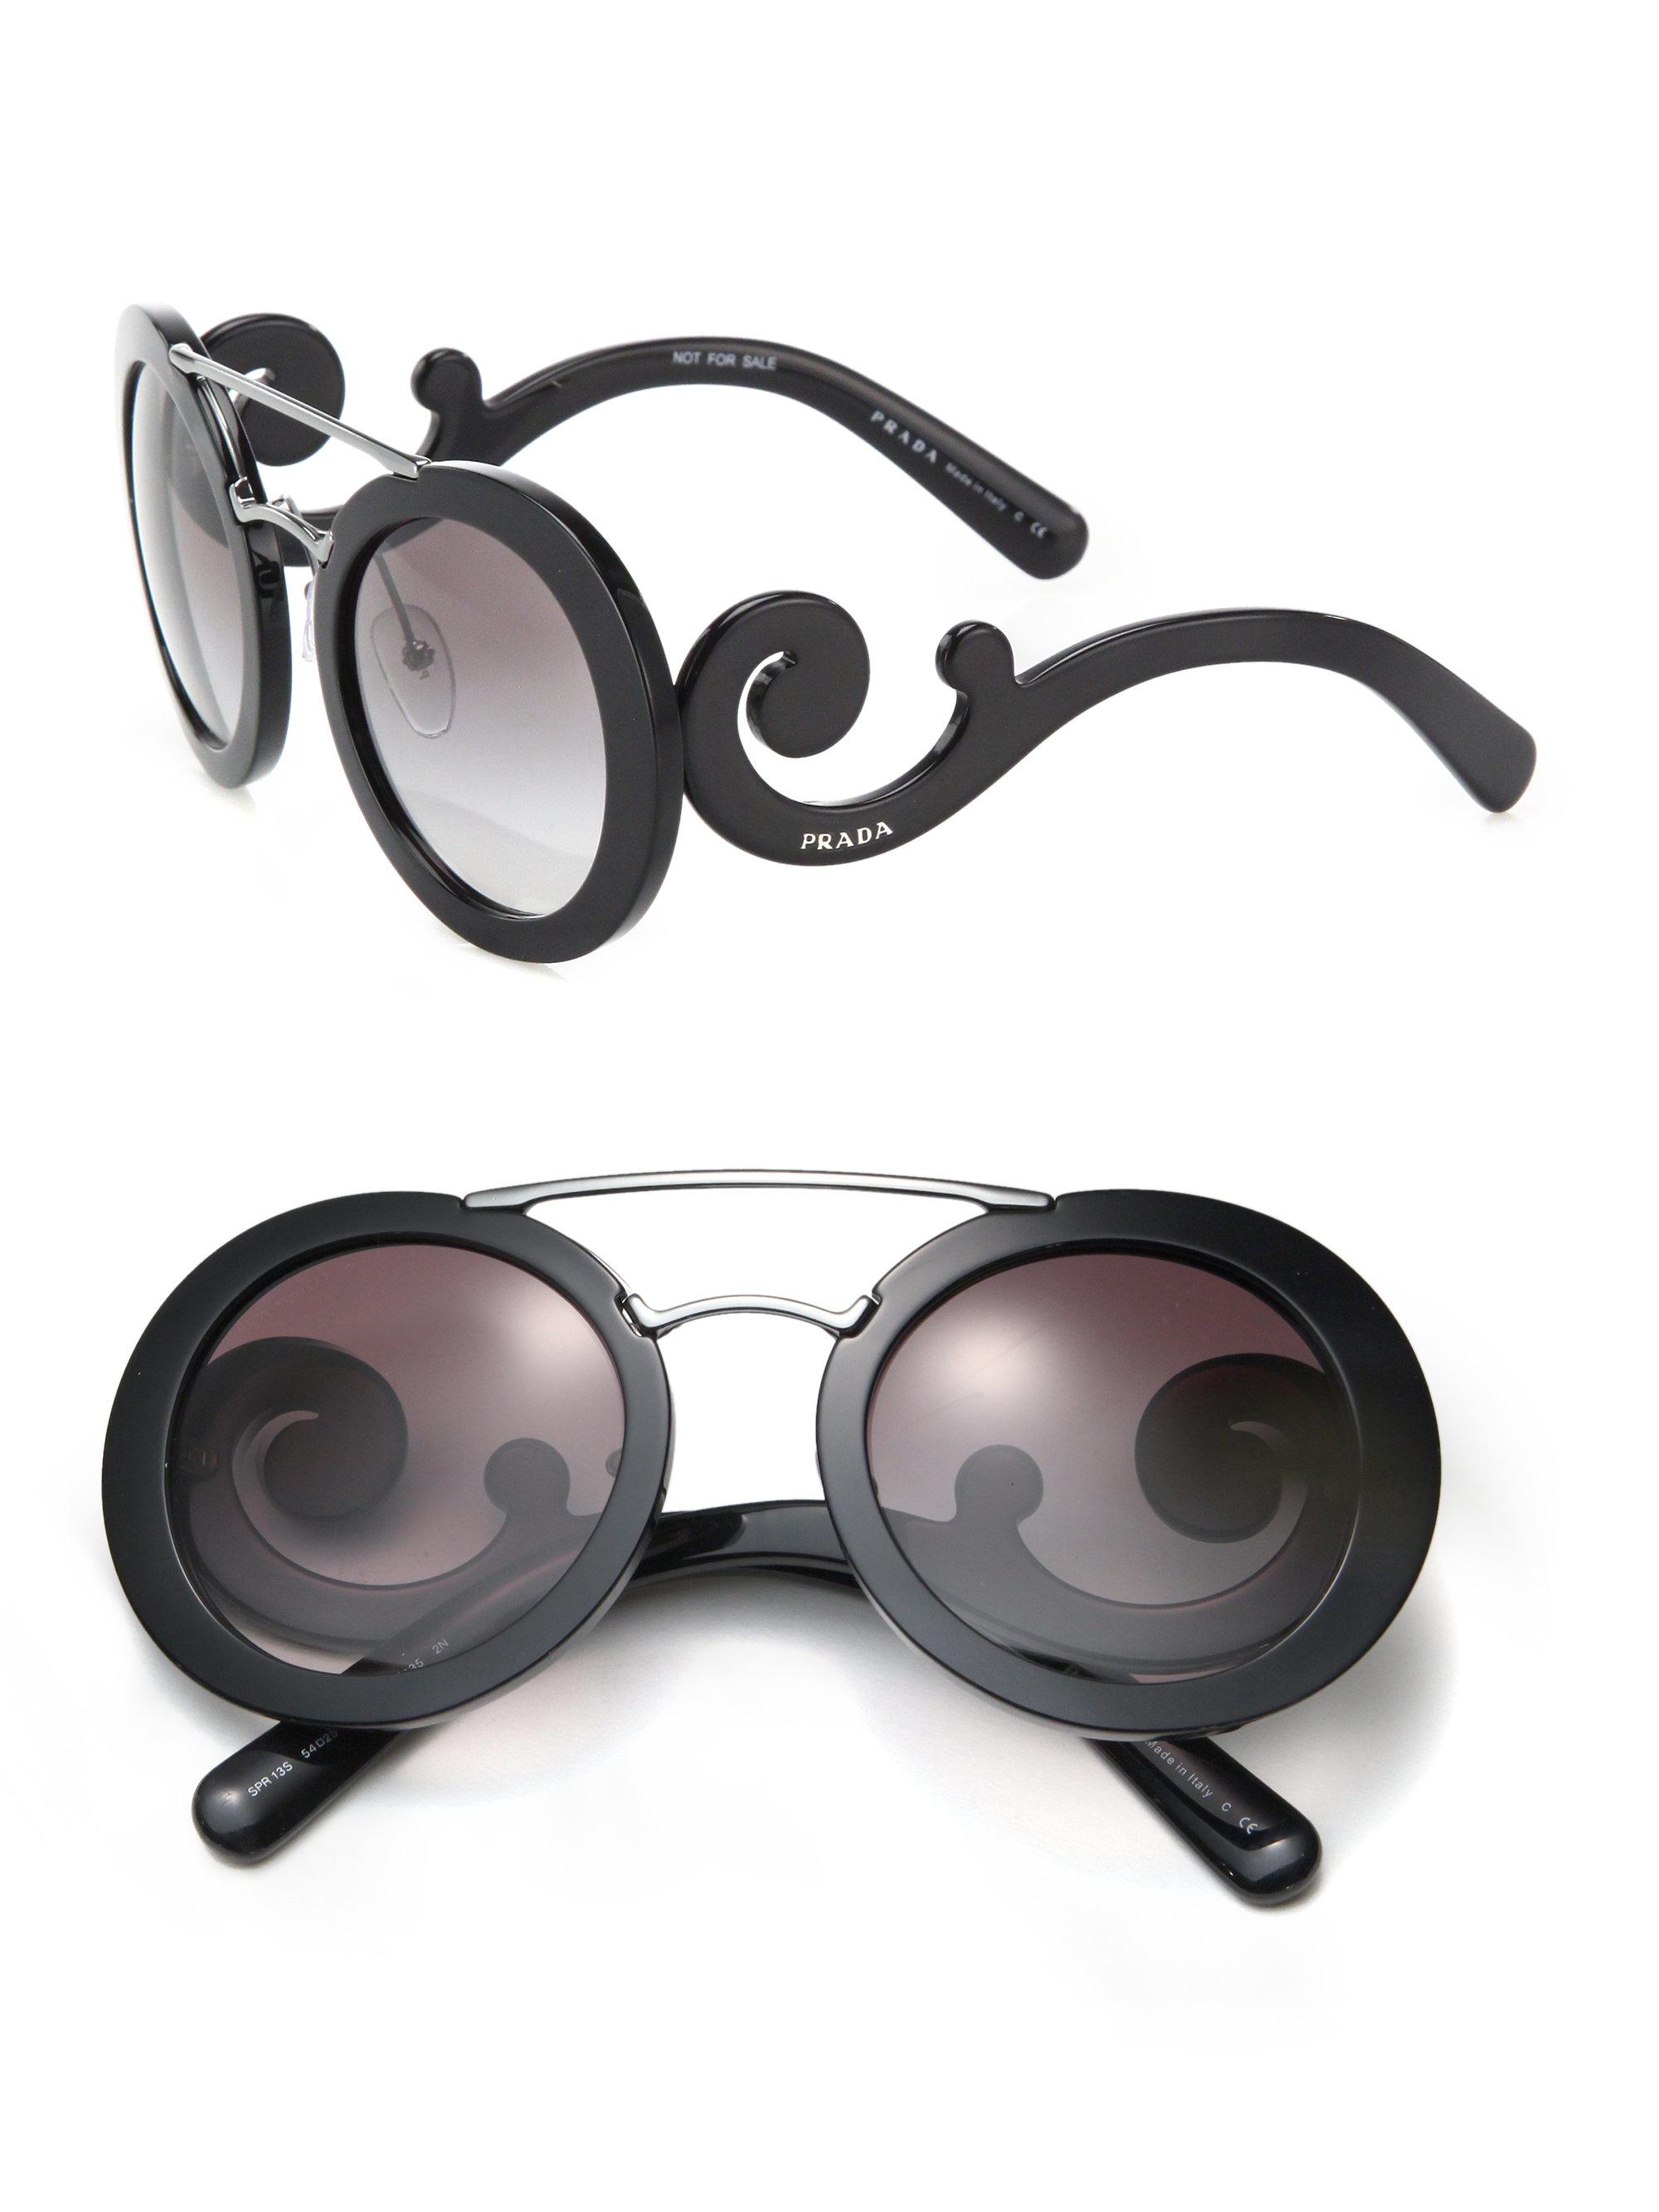 e404b3879d429 ... sale lyst prada 54mm round acetate metal sunglasses in black 72022 99aed